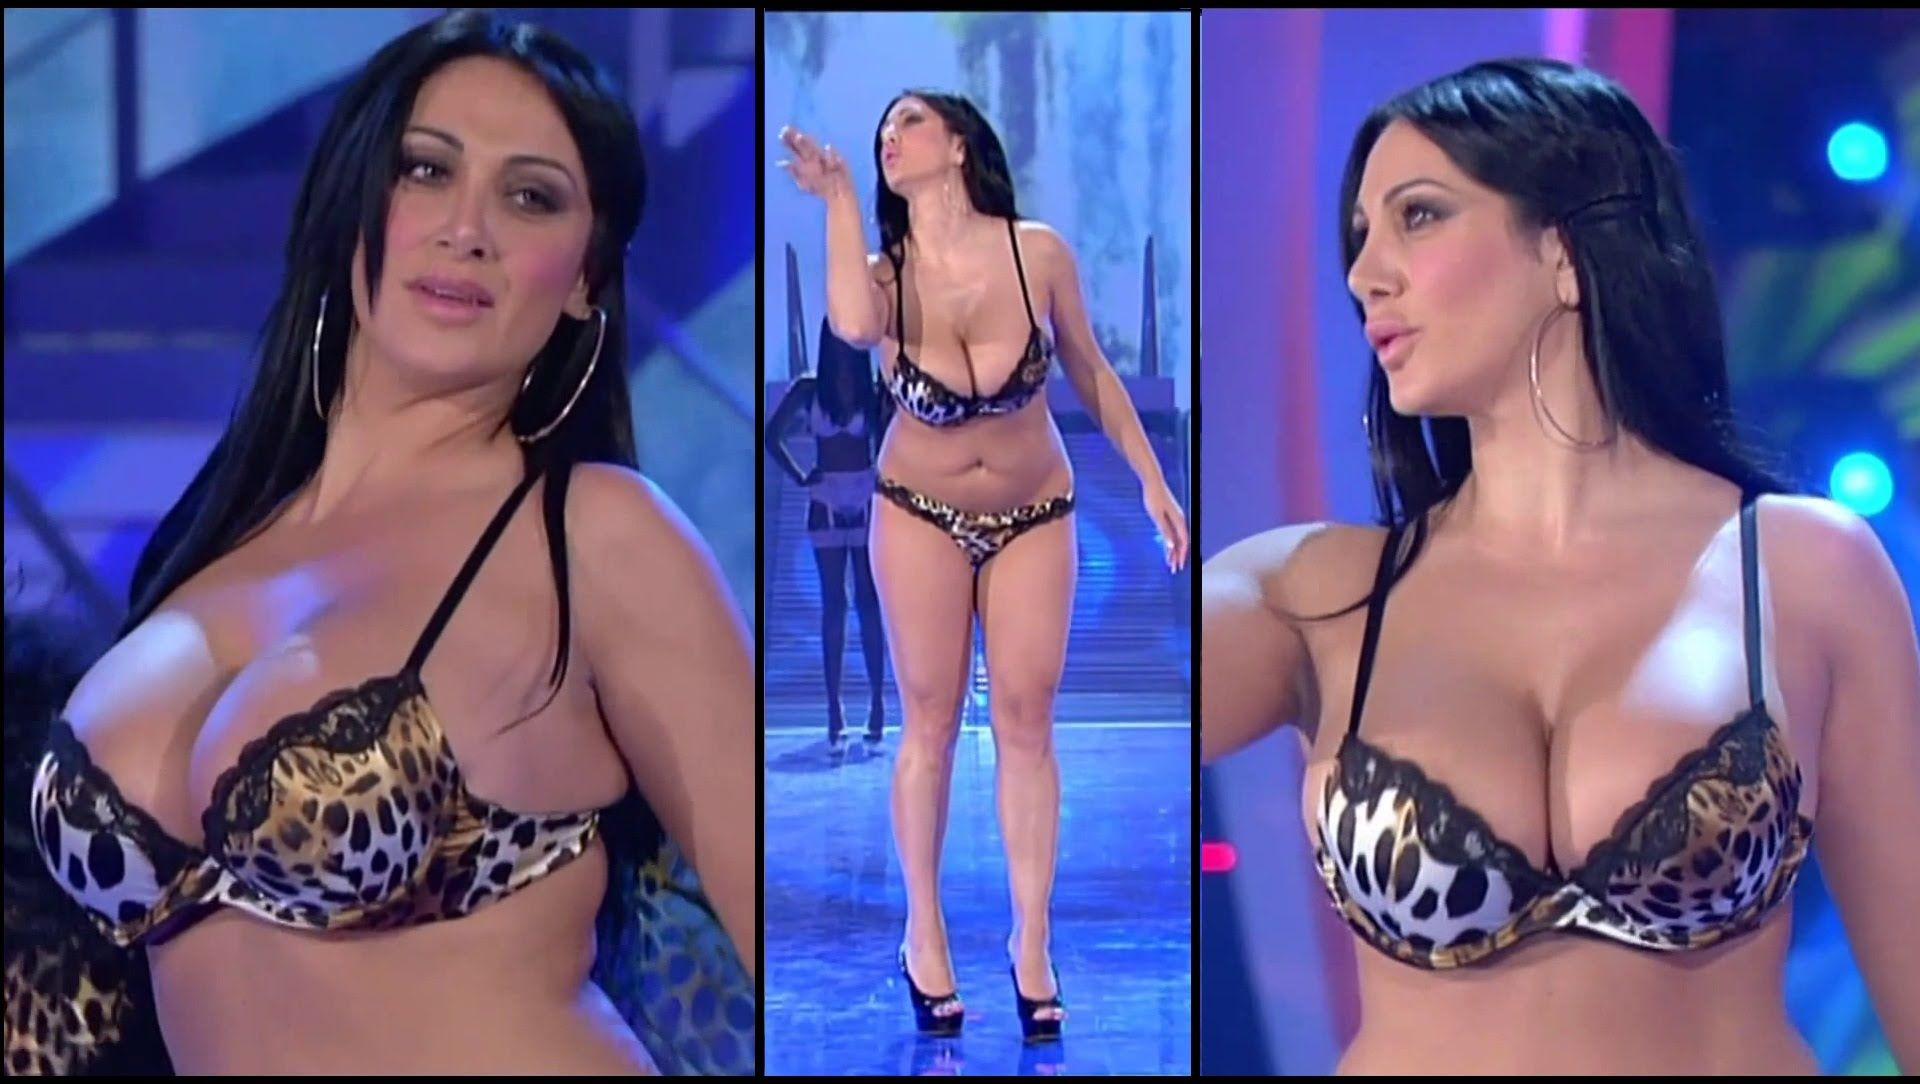 italian model in a bikini with nice big boobs | lingerie show video